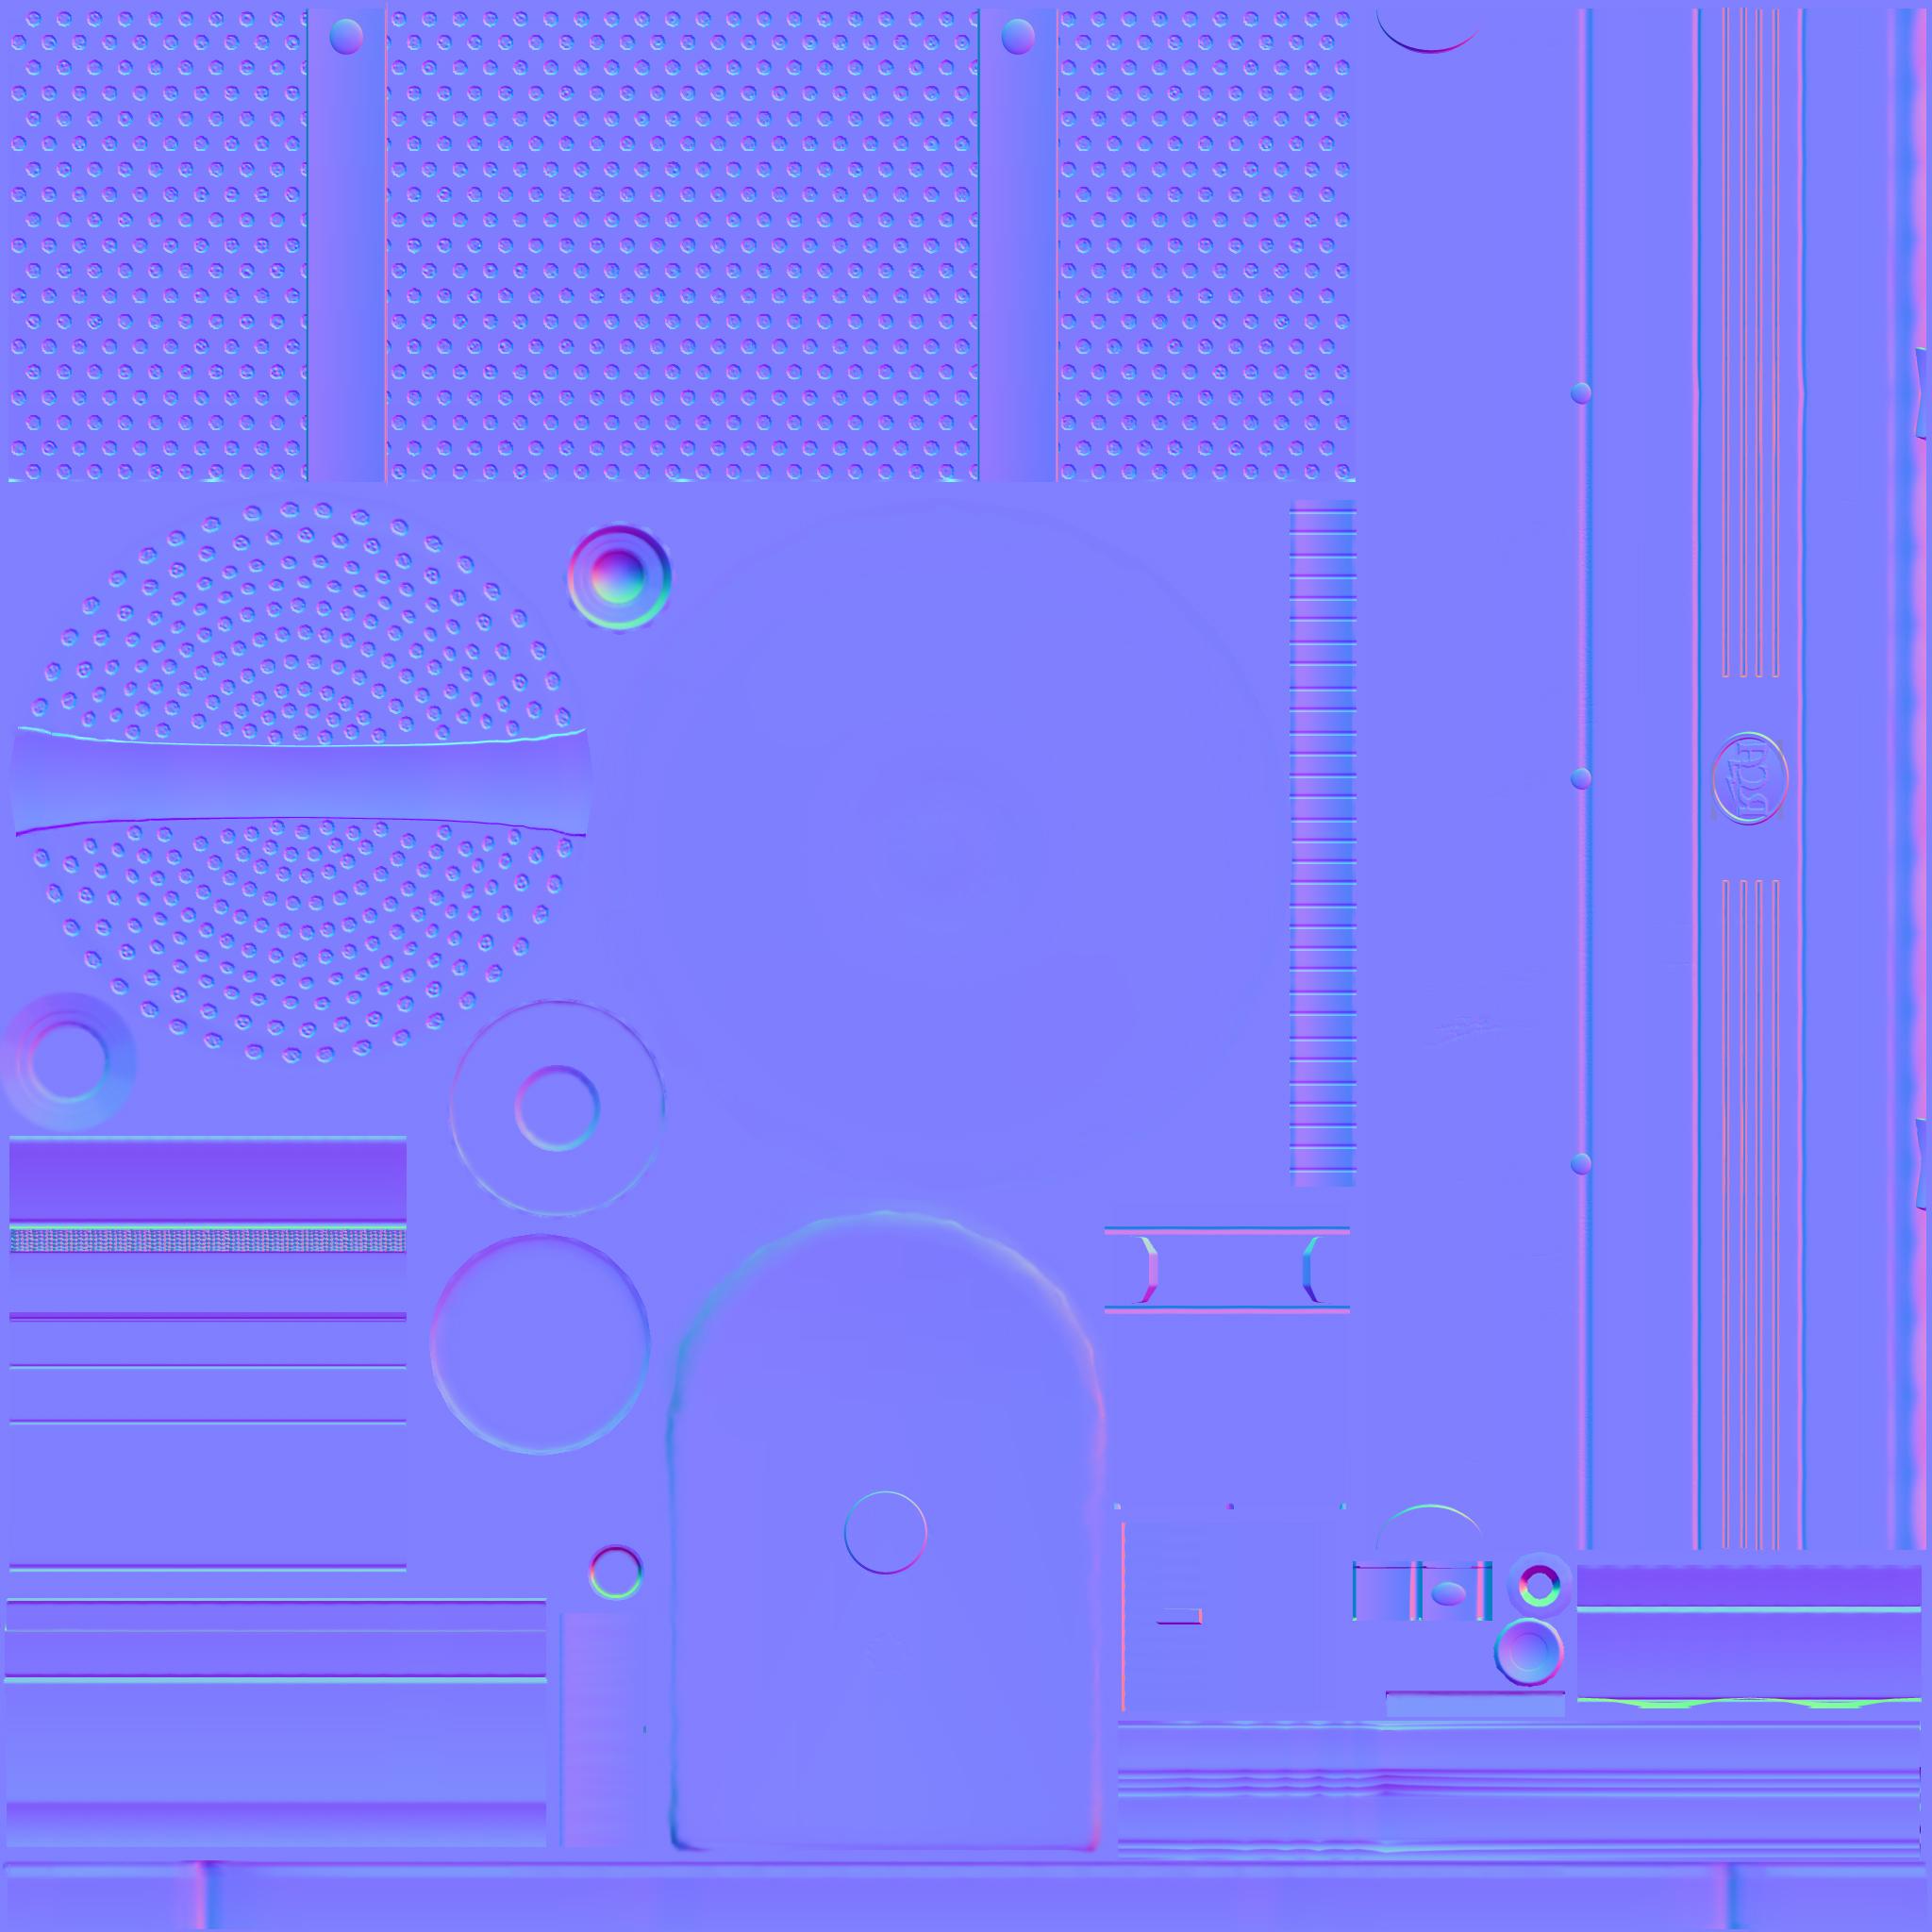 rca77-c1_Norm.jpg